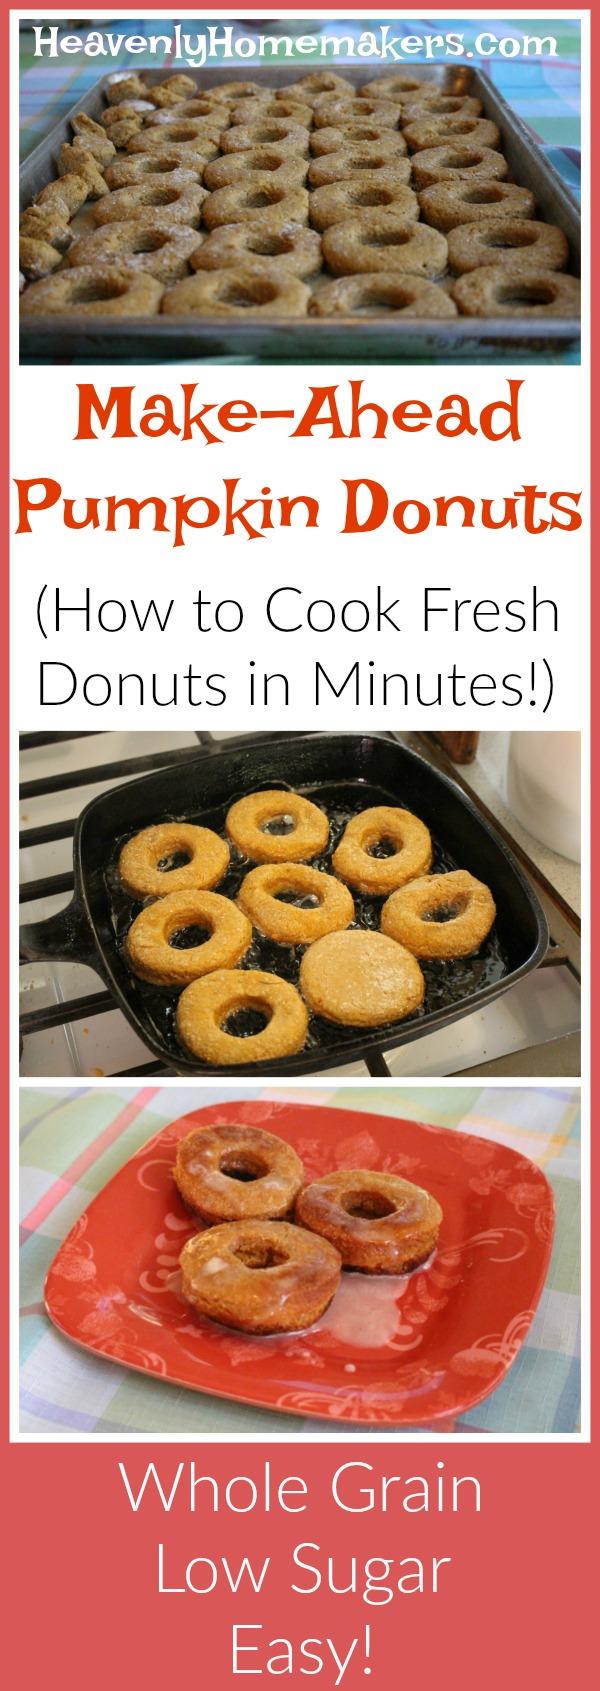 Make-Ahead Pumpkin Donuts (Whole Grain, Low Sugar, Easy!)